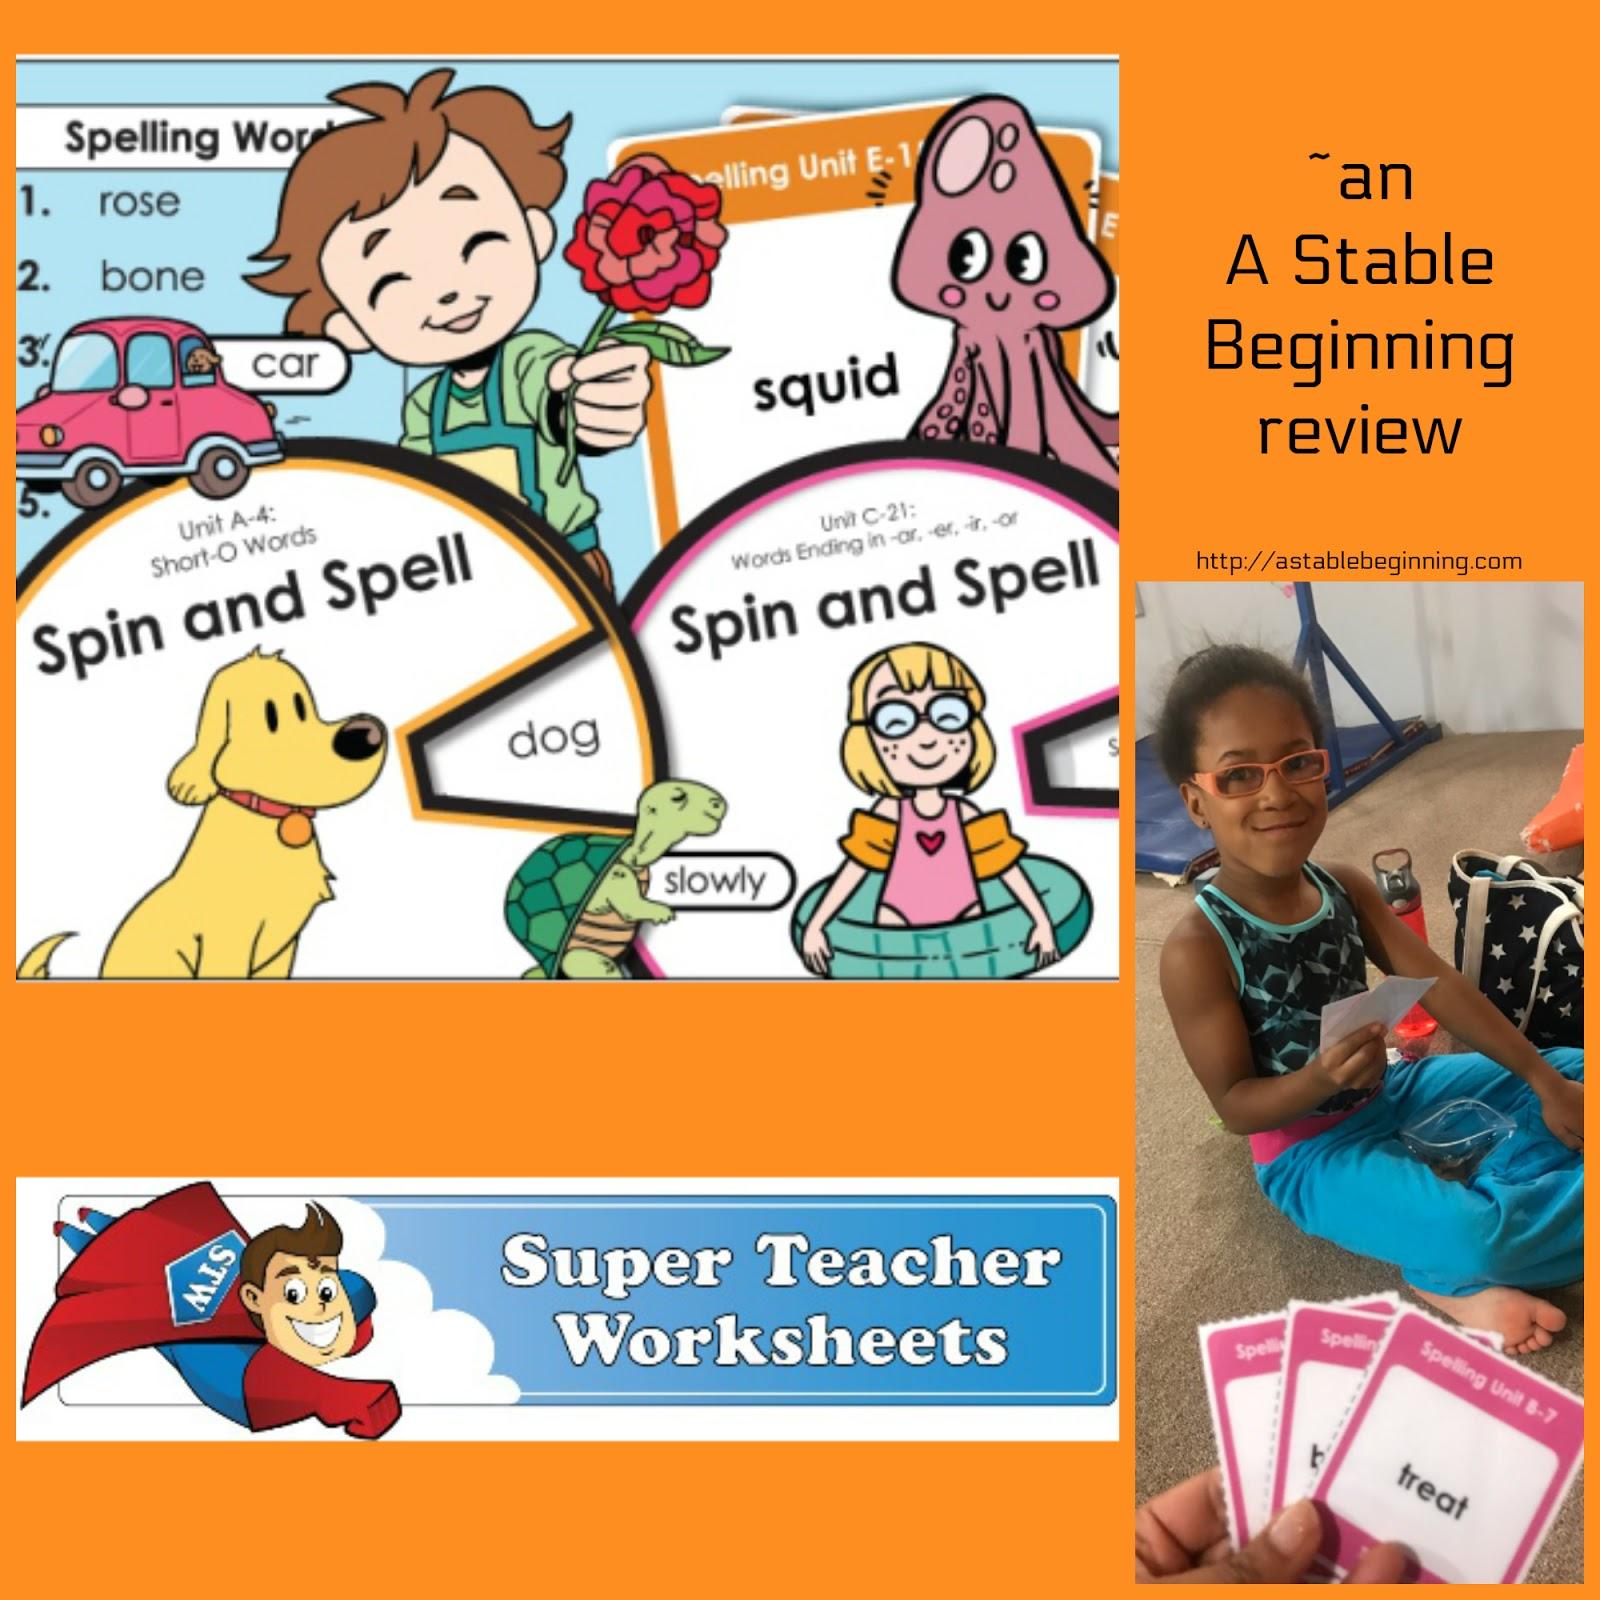 - A Stable Beginning: Super Teacher Worksheets: Worksheets Made Easy